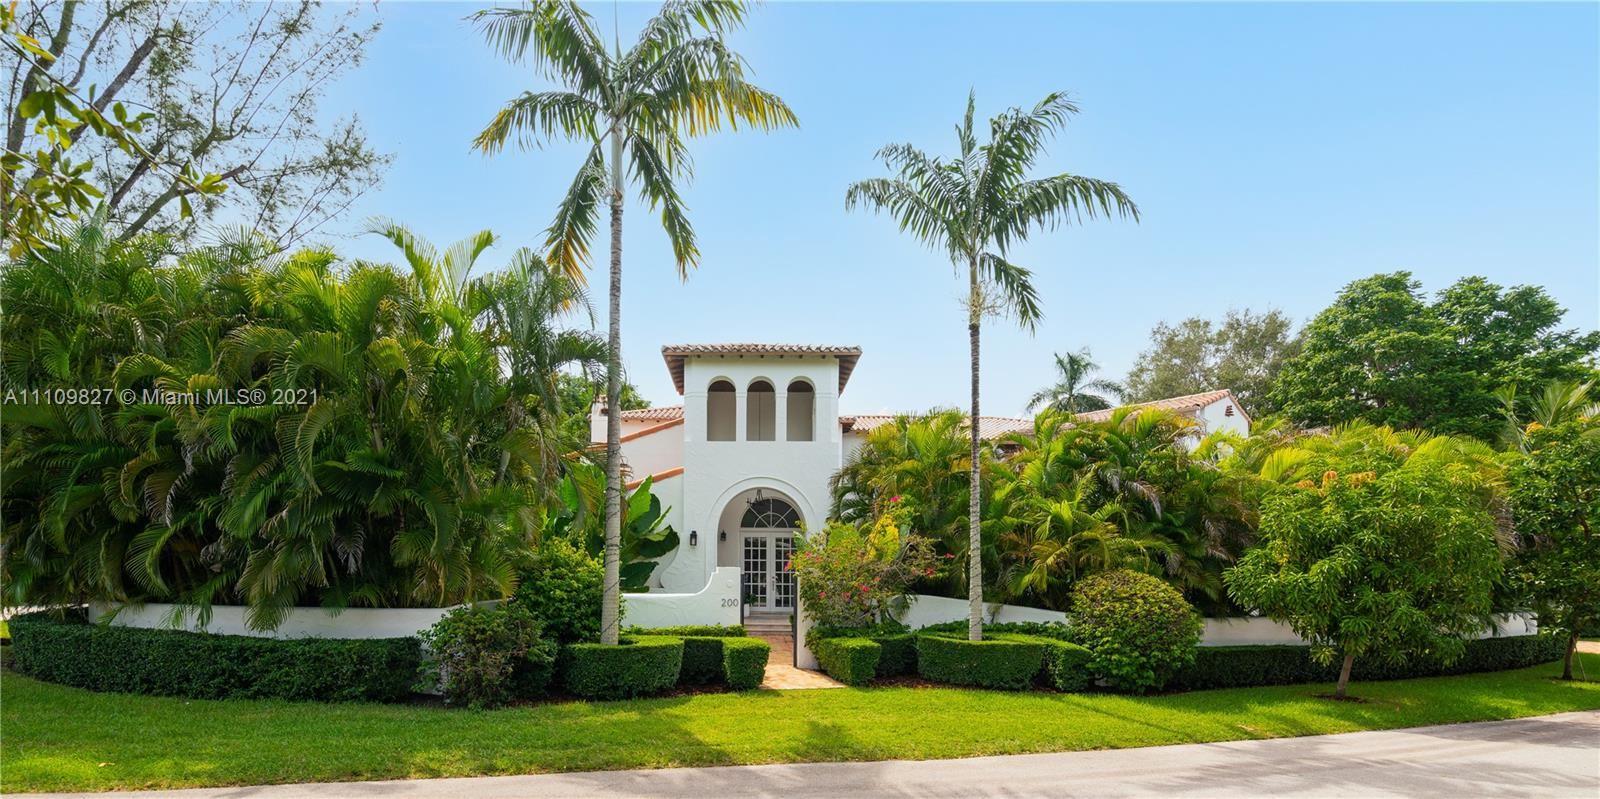 Photo of 200 Ridgewood Rd, Coral Gables, FL 33133 (MLS # A11109827)